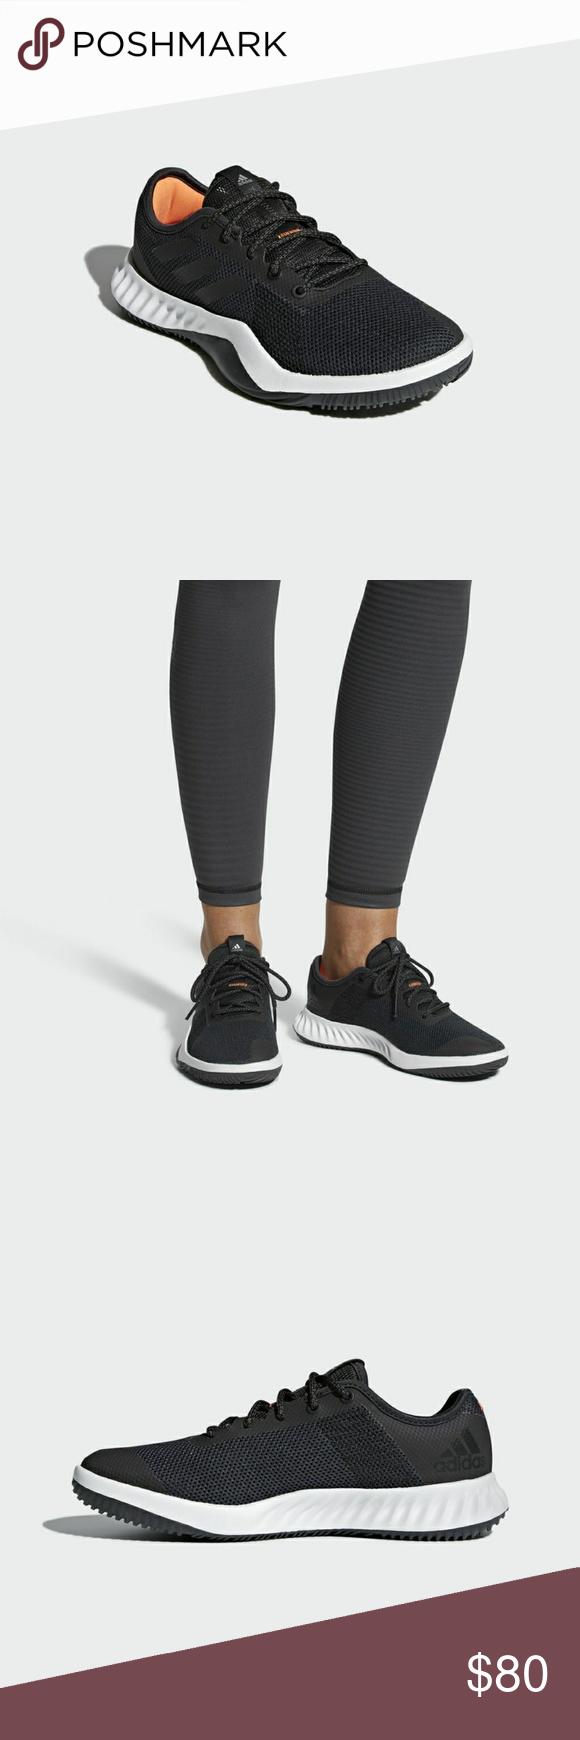 Comparable Grifo pasajero  Adidas CRAZYTRAIN LT SHOES CG3496 H1 | Shoes, Adidas, Turf shoes